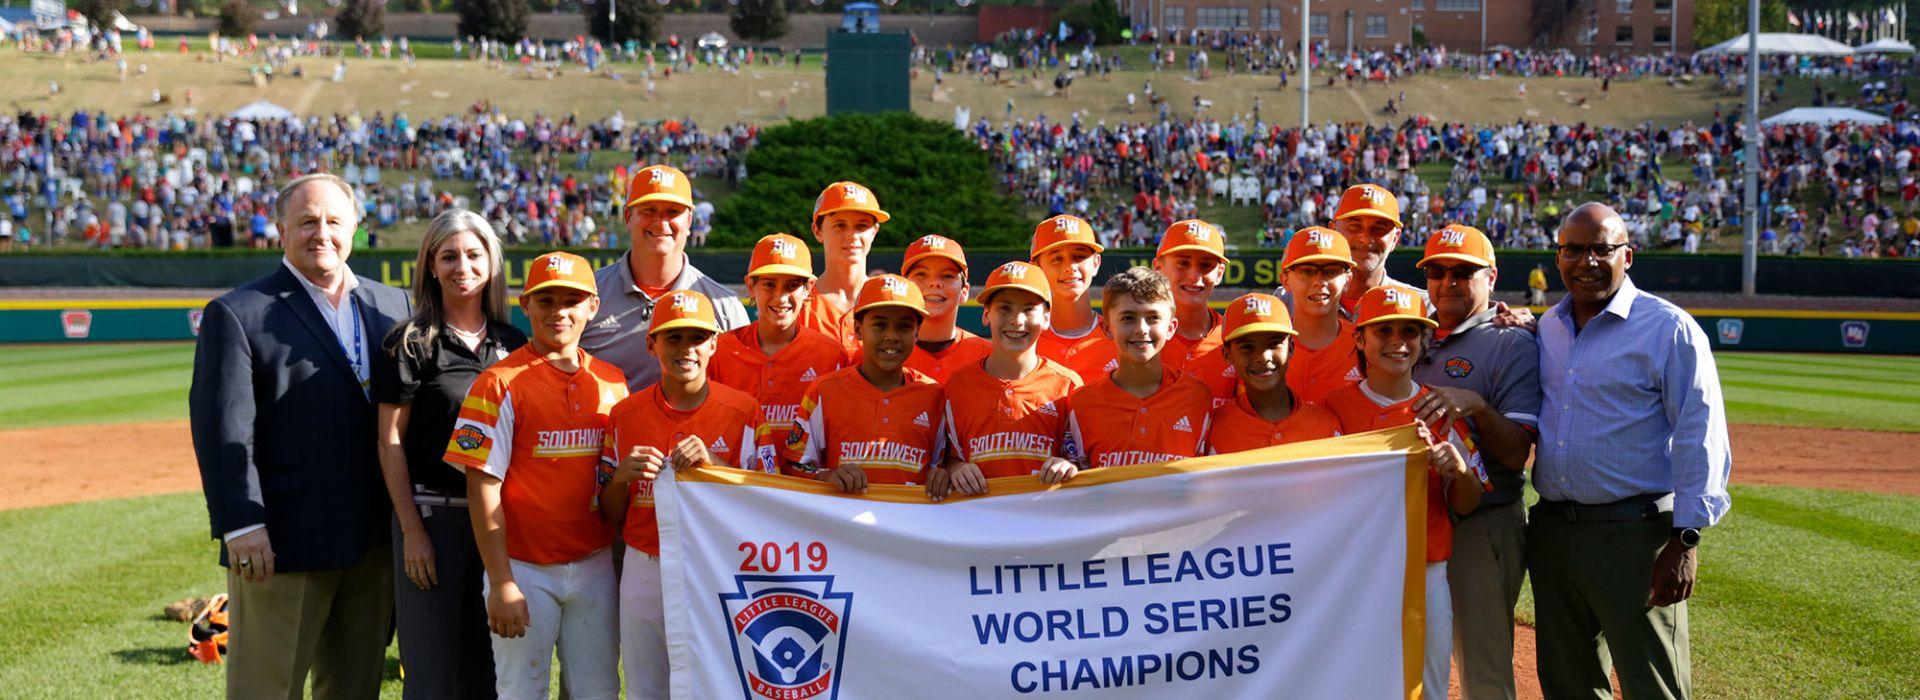 Little League World Champions